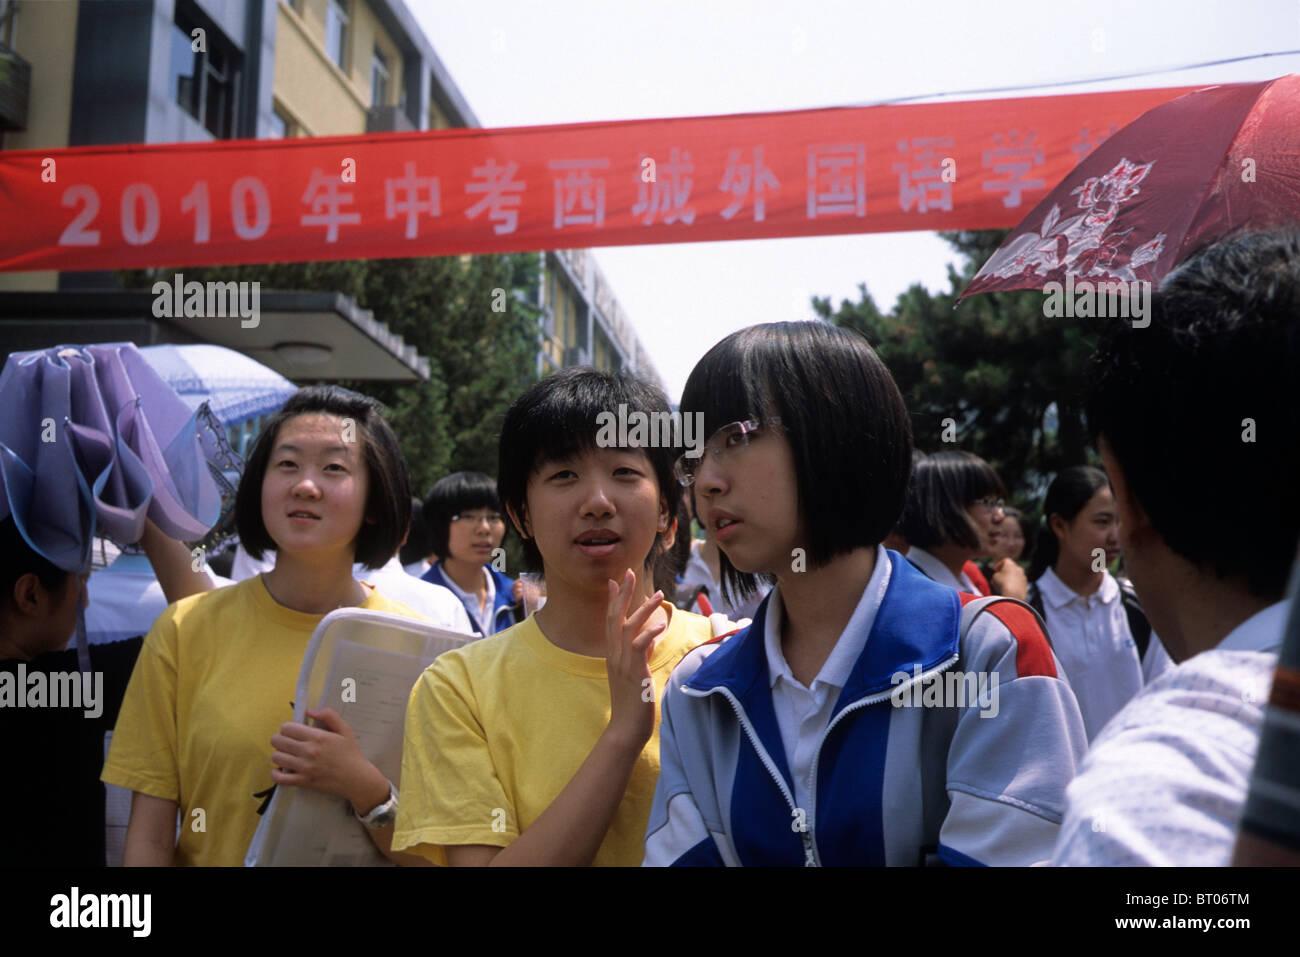 Senior high school entrance examination in Beijing, China. 24-Jun-2010 - Stock Image